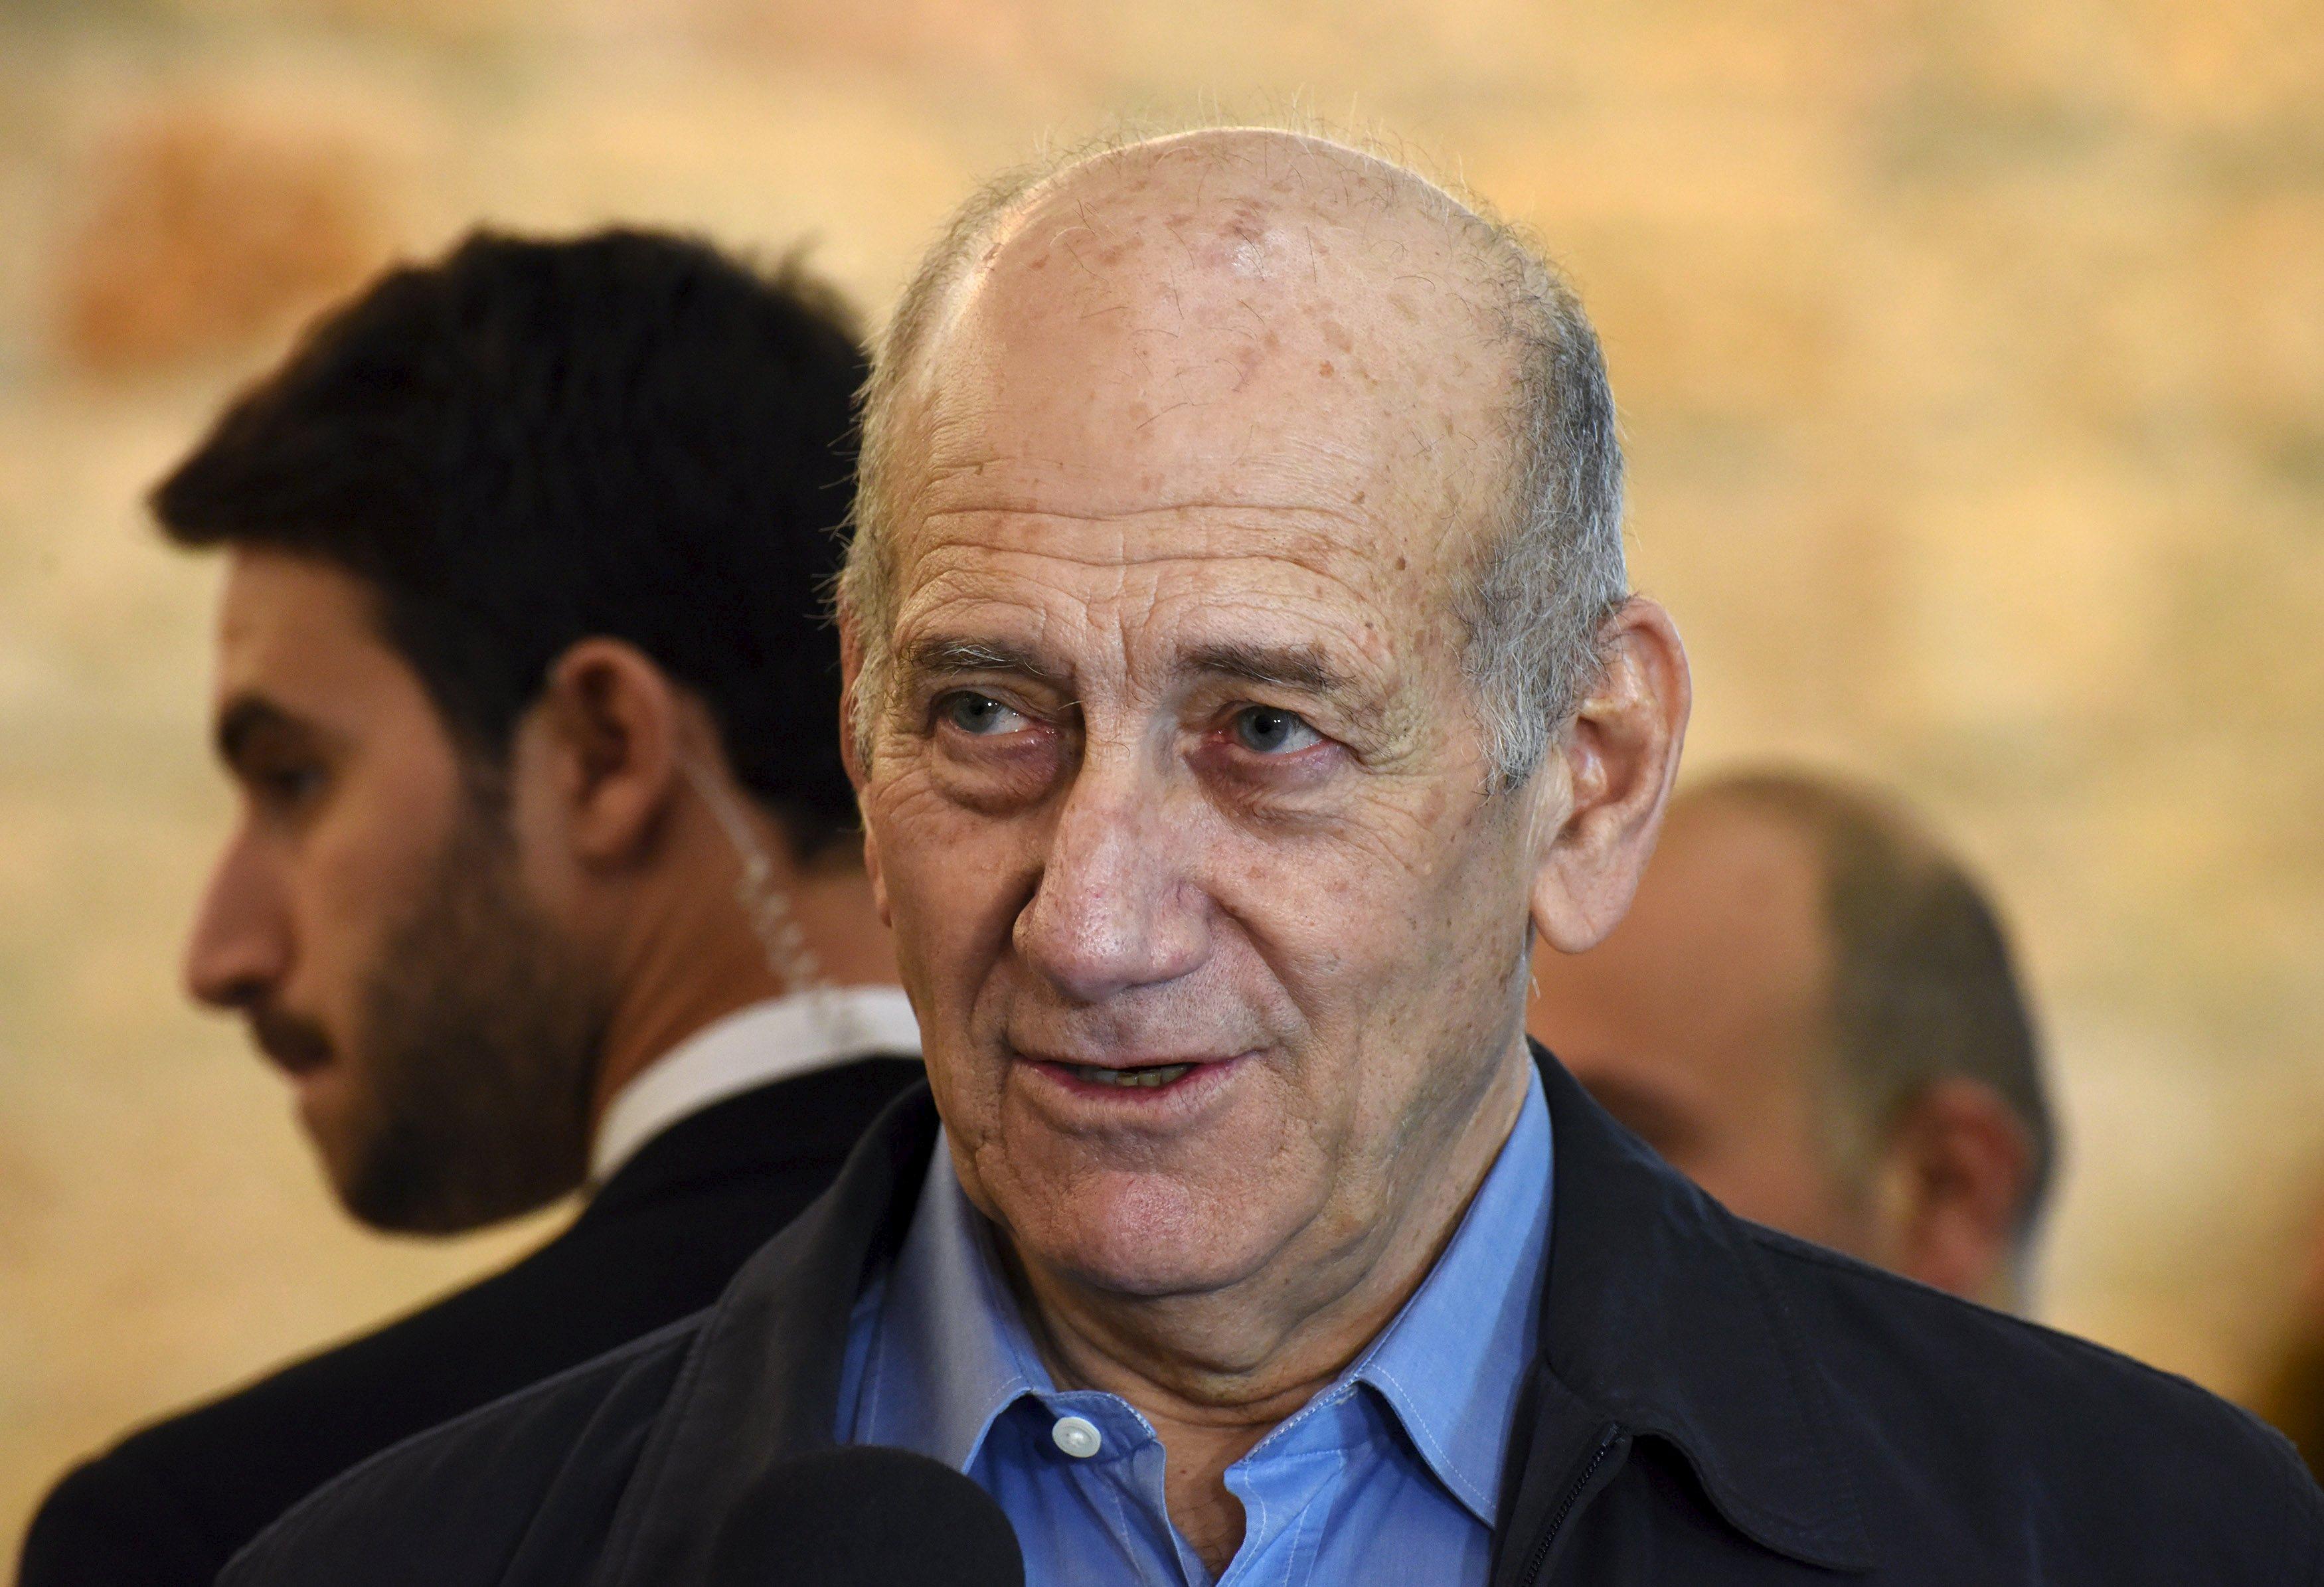 Former Israeli Prime Minister Ehud Olmert speaks to the media after a hearing at the Supreme Court in Jerusalem December 29, 2015. Photo: Reuters